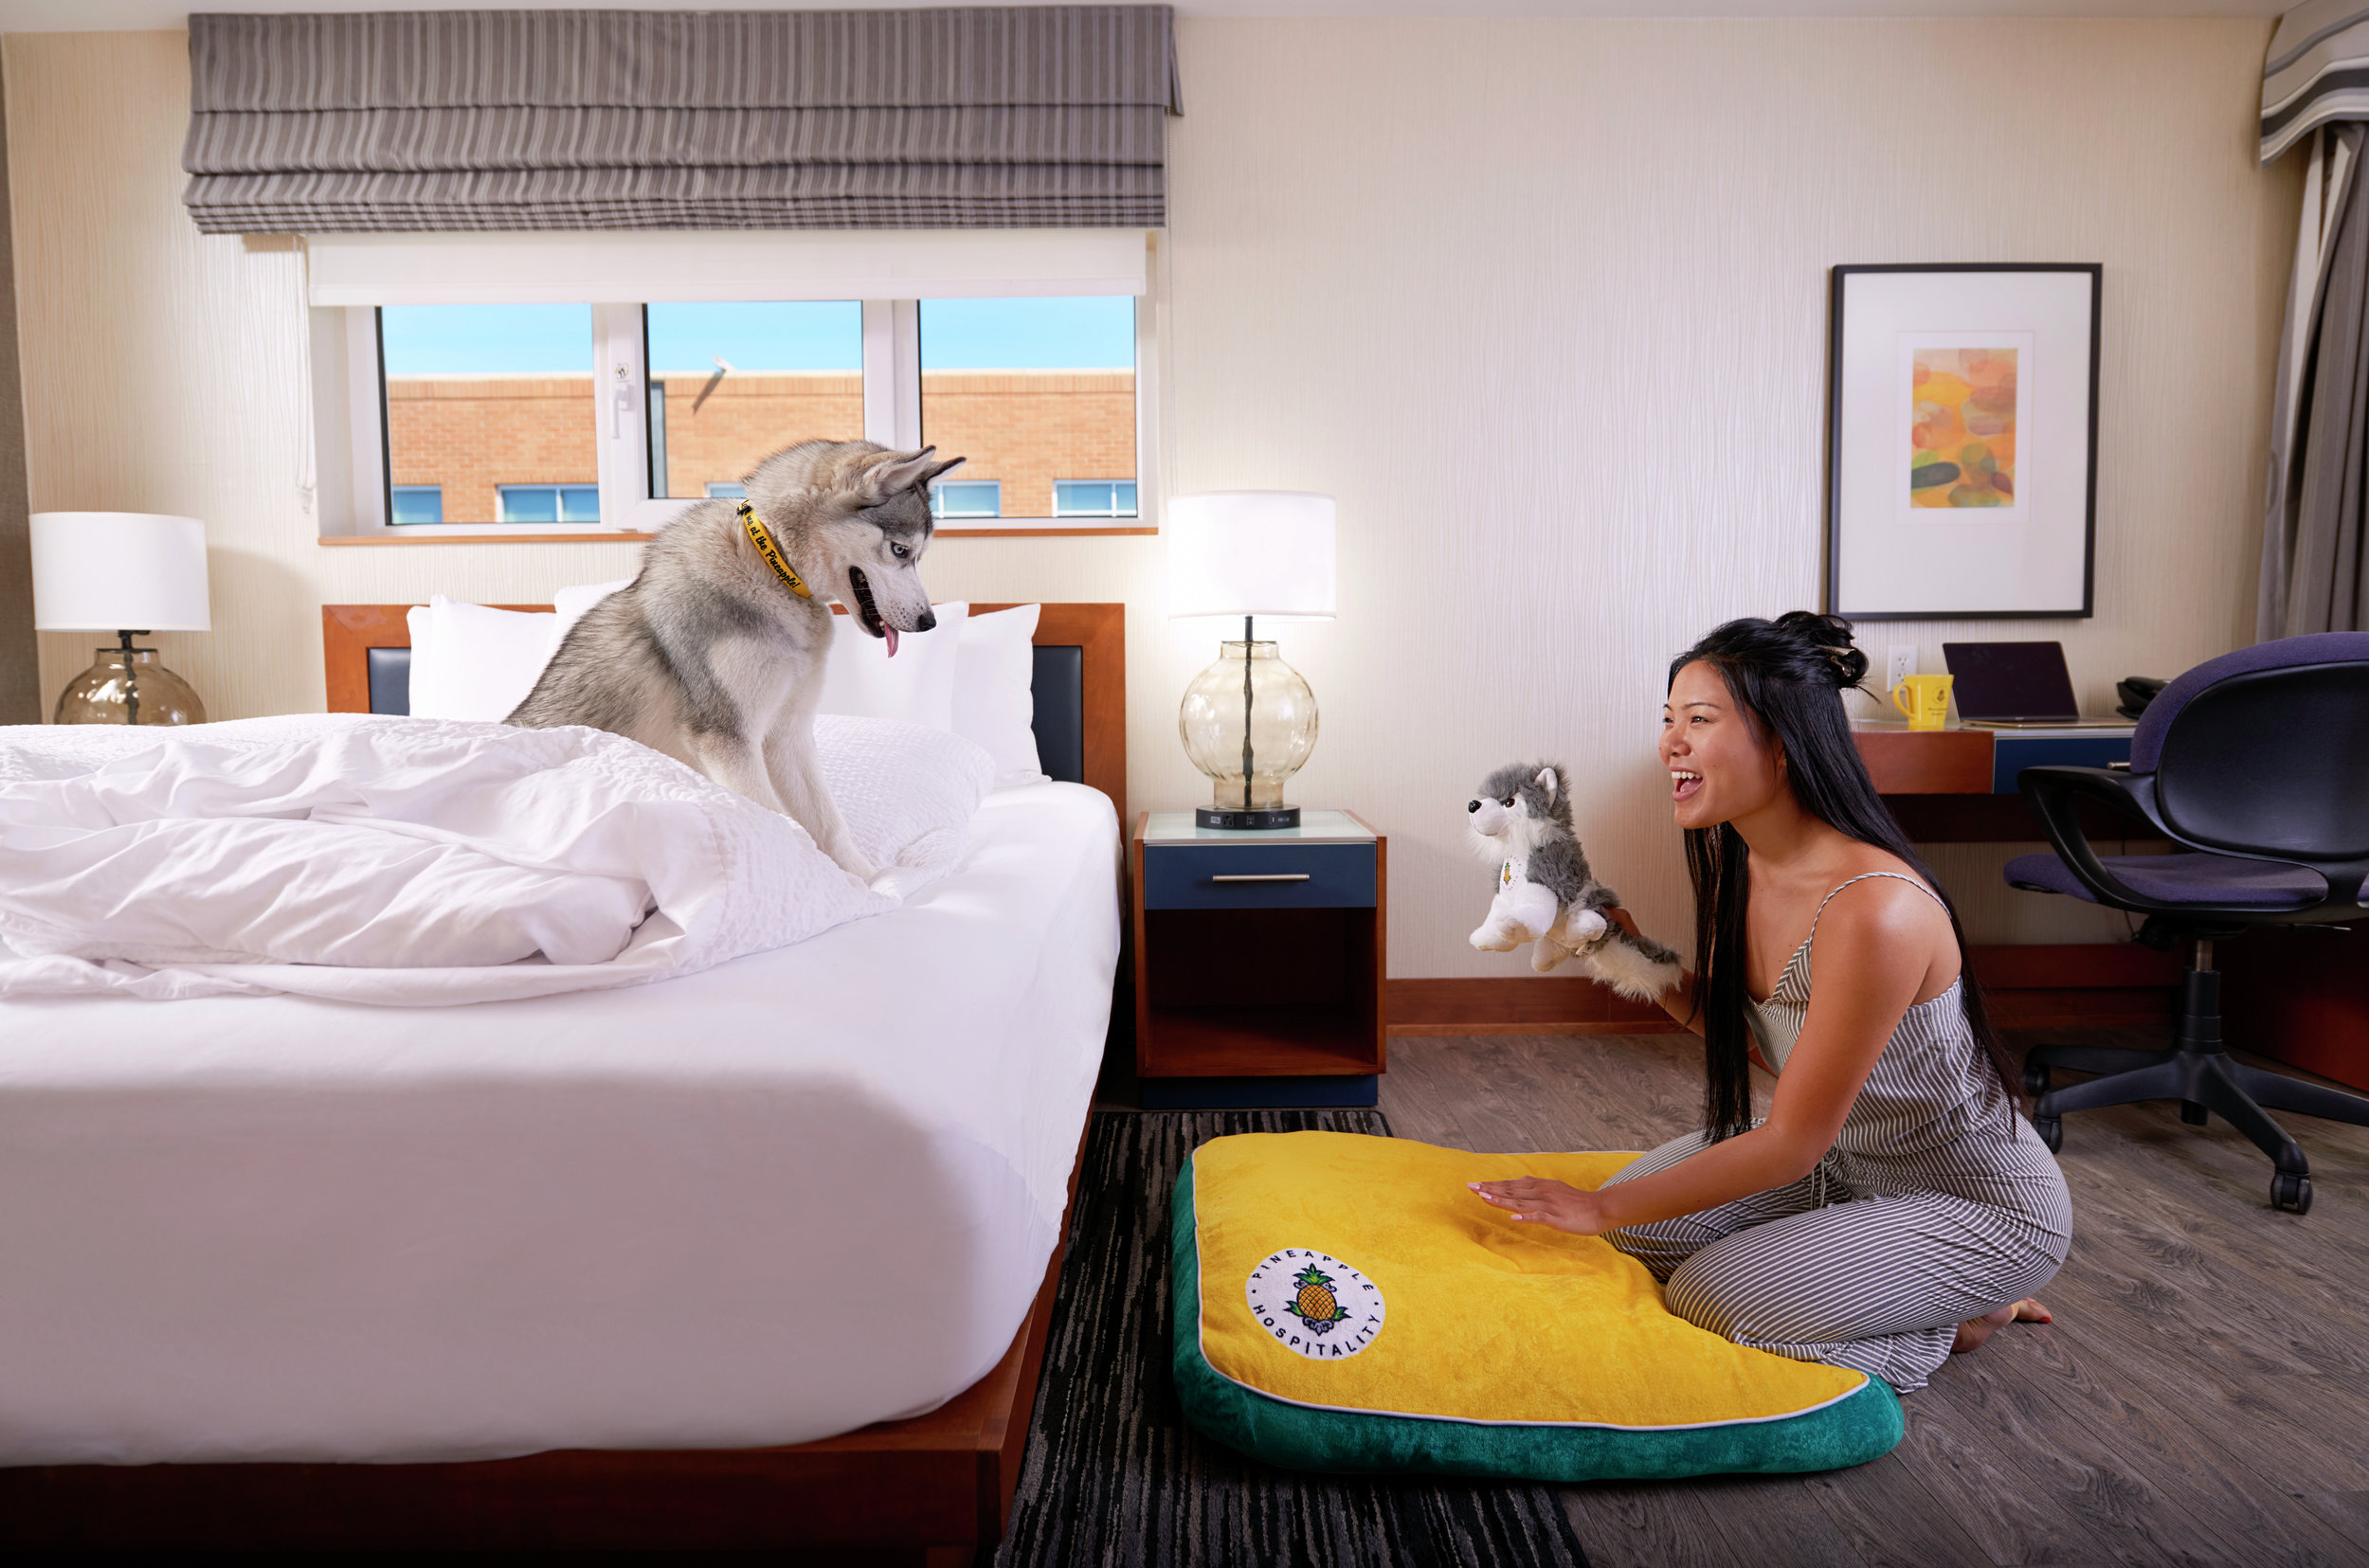 Lifestyle-2017-Girl-Dog-Husky-Room-Bed-DSC-0596-3499x2317.jpg